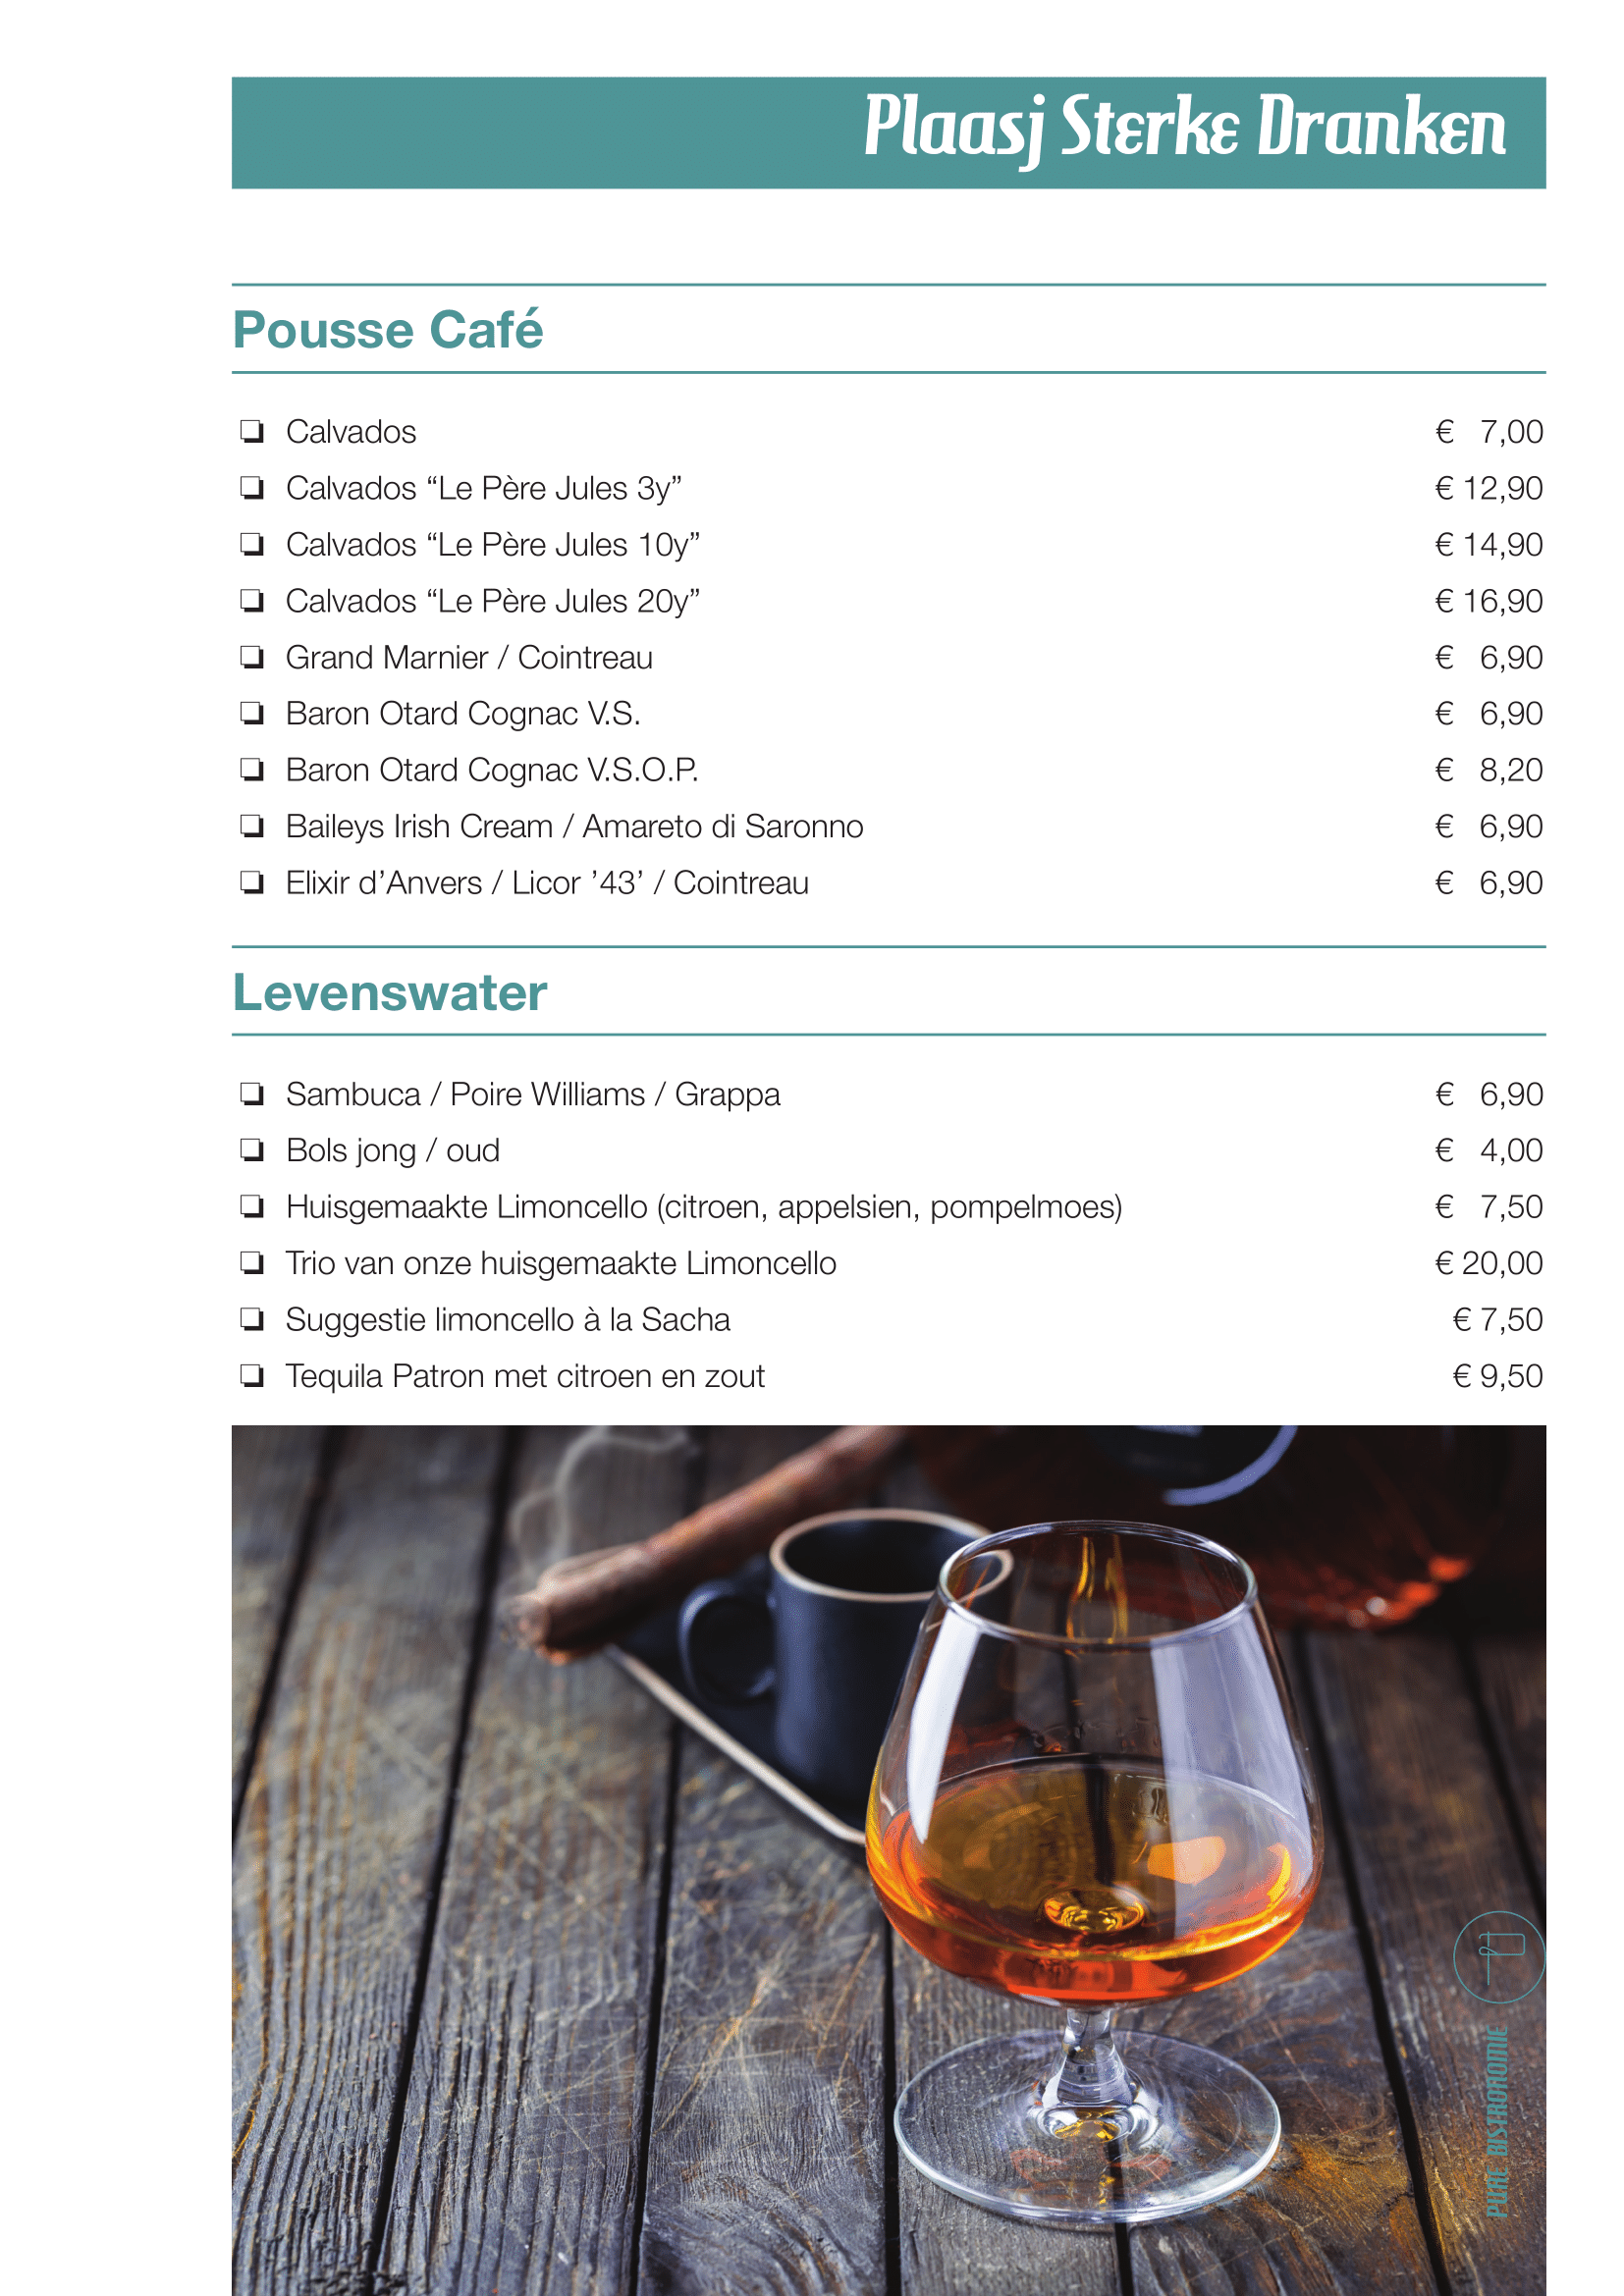 Plaasj-Drank-Sterke Dranken